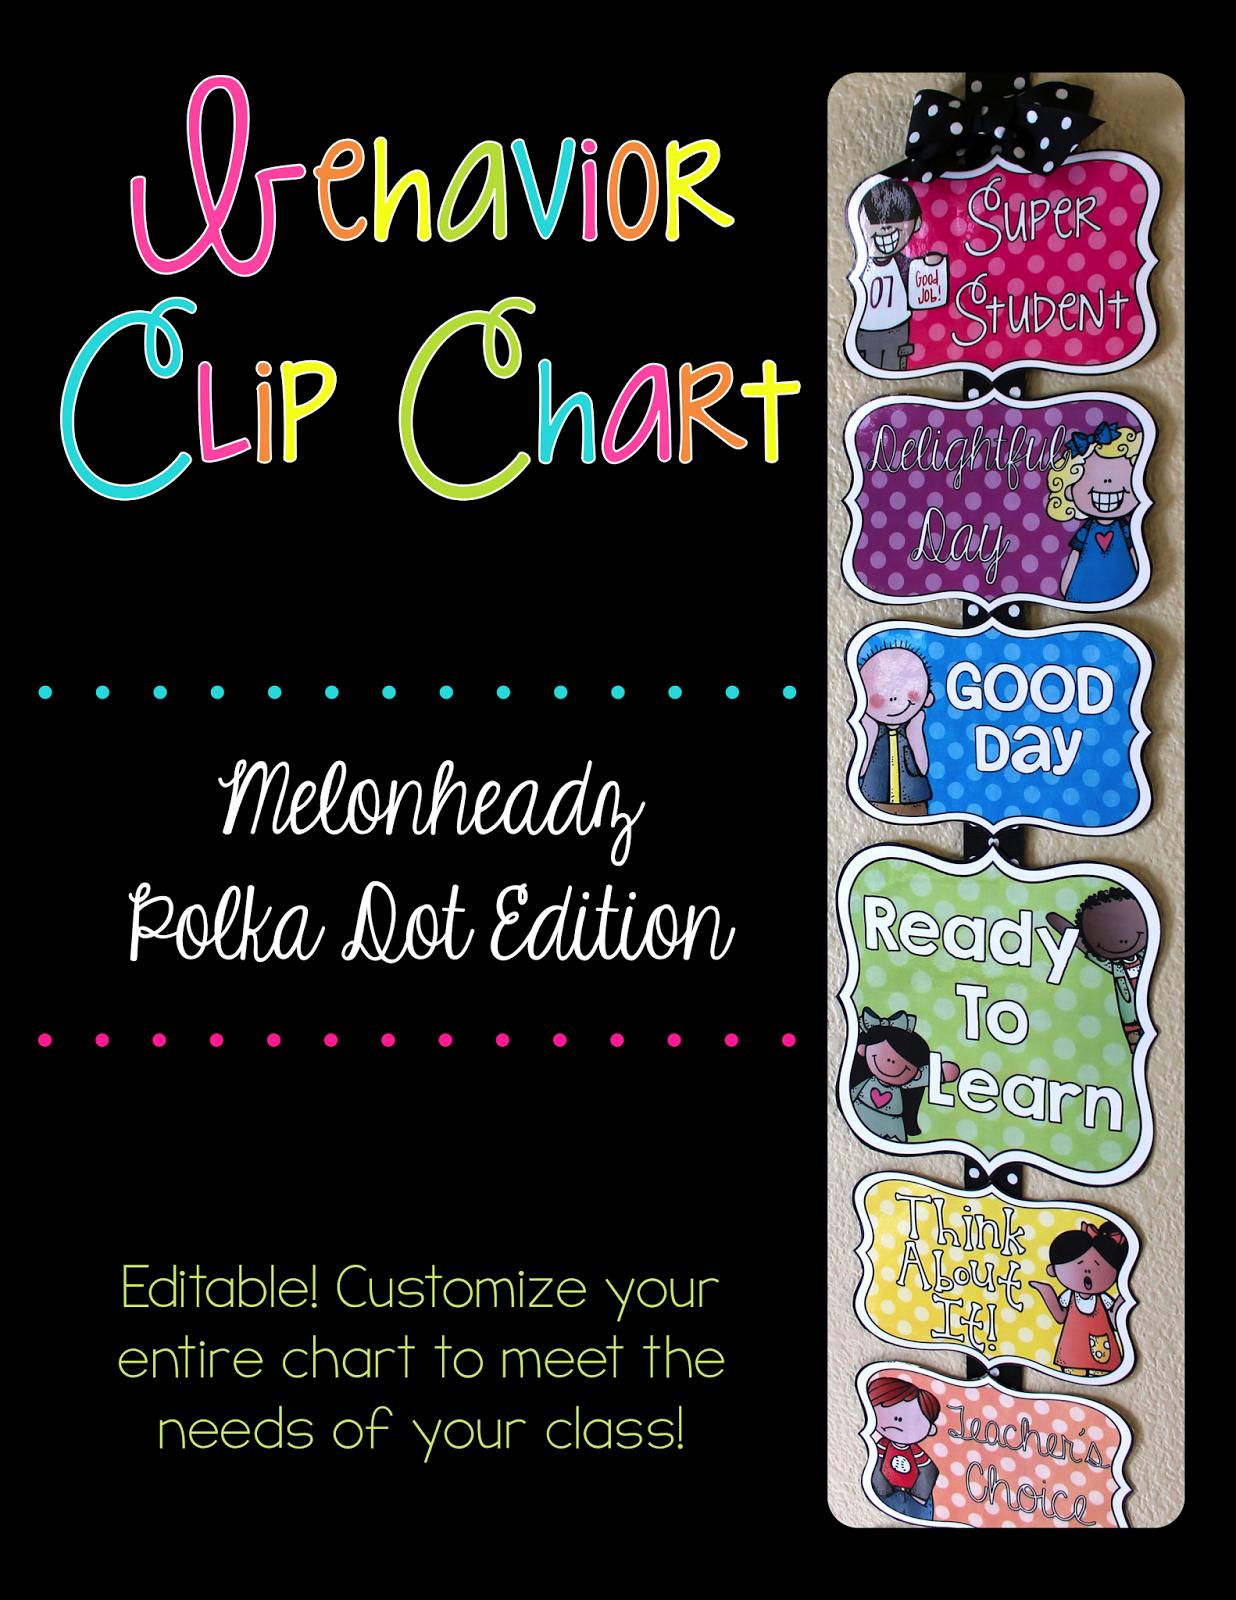 http://www.teacherspayteachers.com/Product/Editable-Behavior-Chart-Melonheadz-Polka-Dot-Edition-1336804